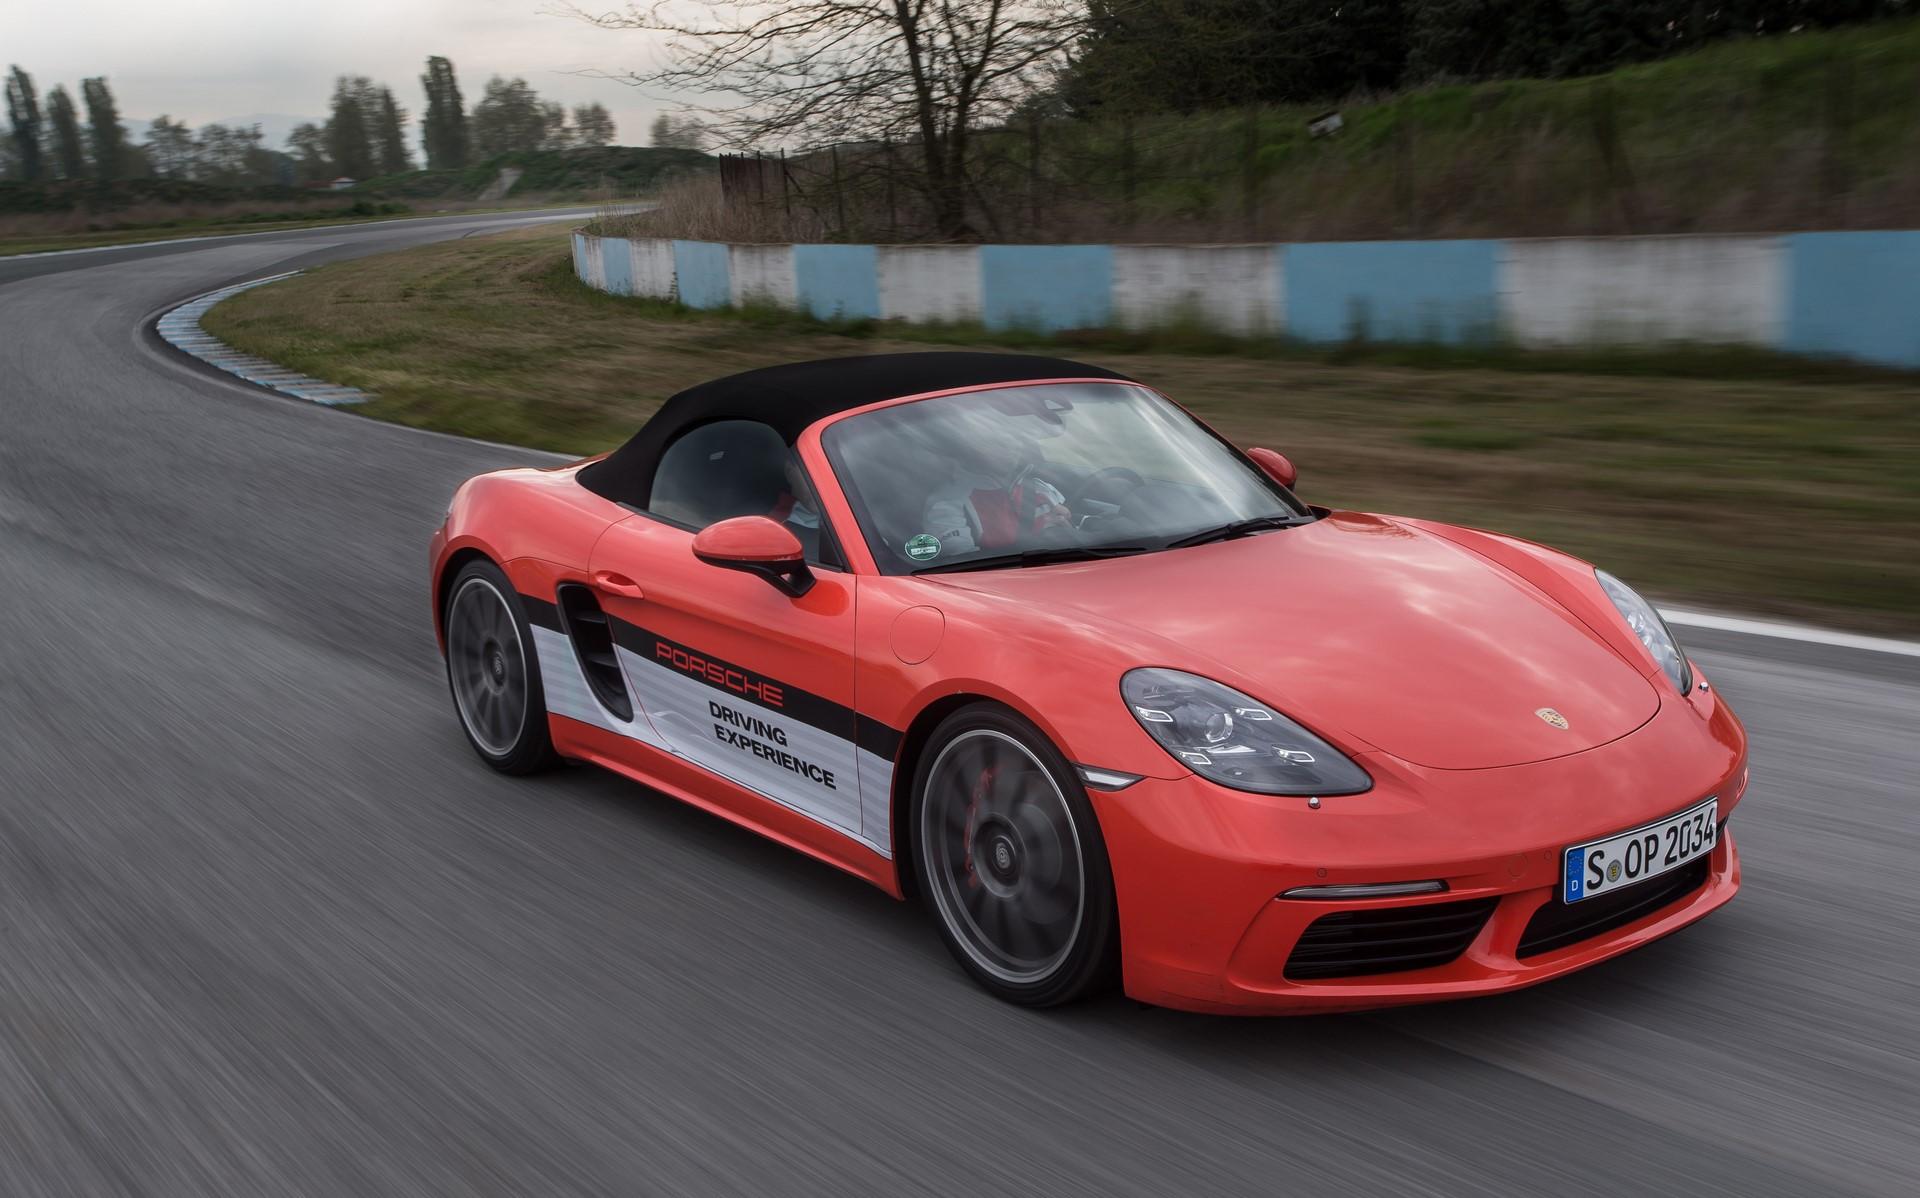 Porsche Driving Experience 2017 Serres (32)